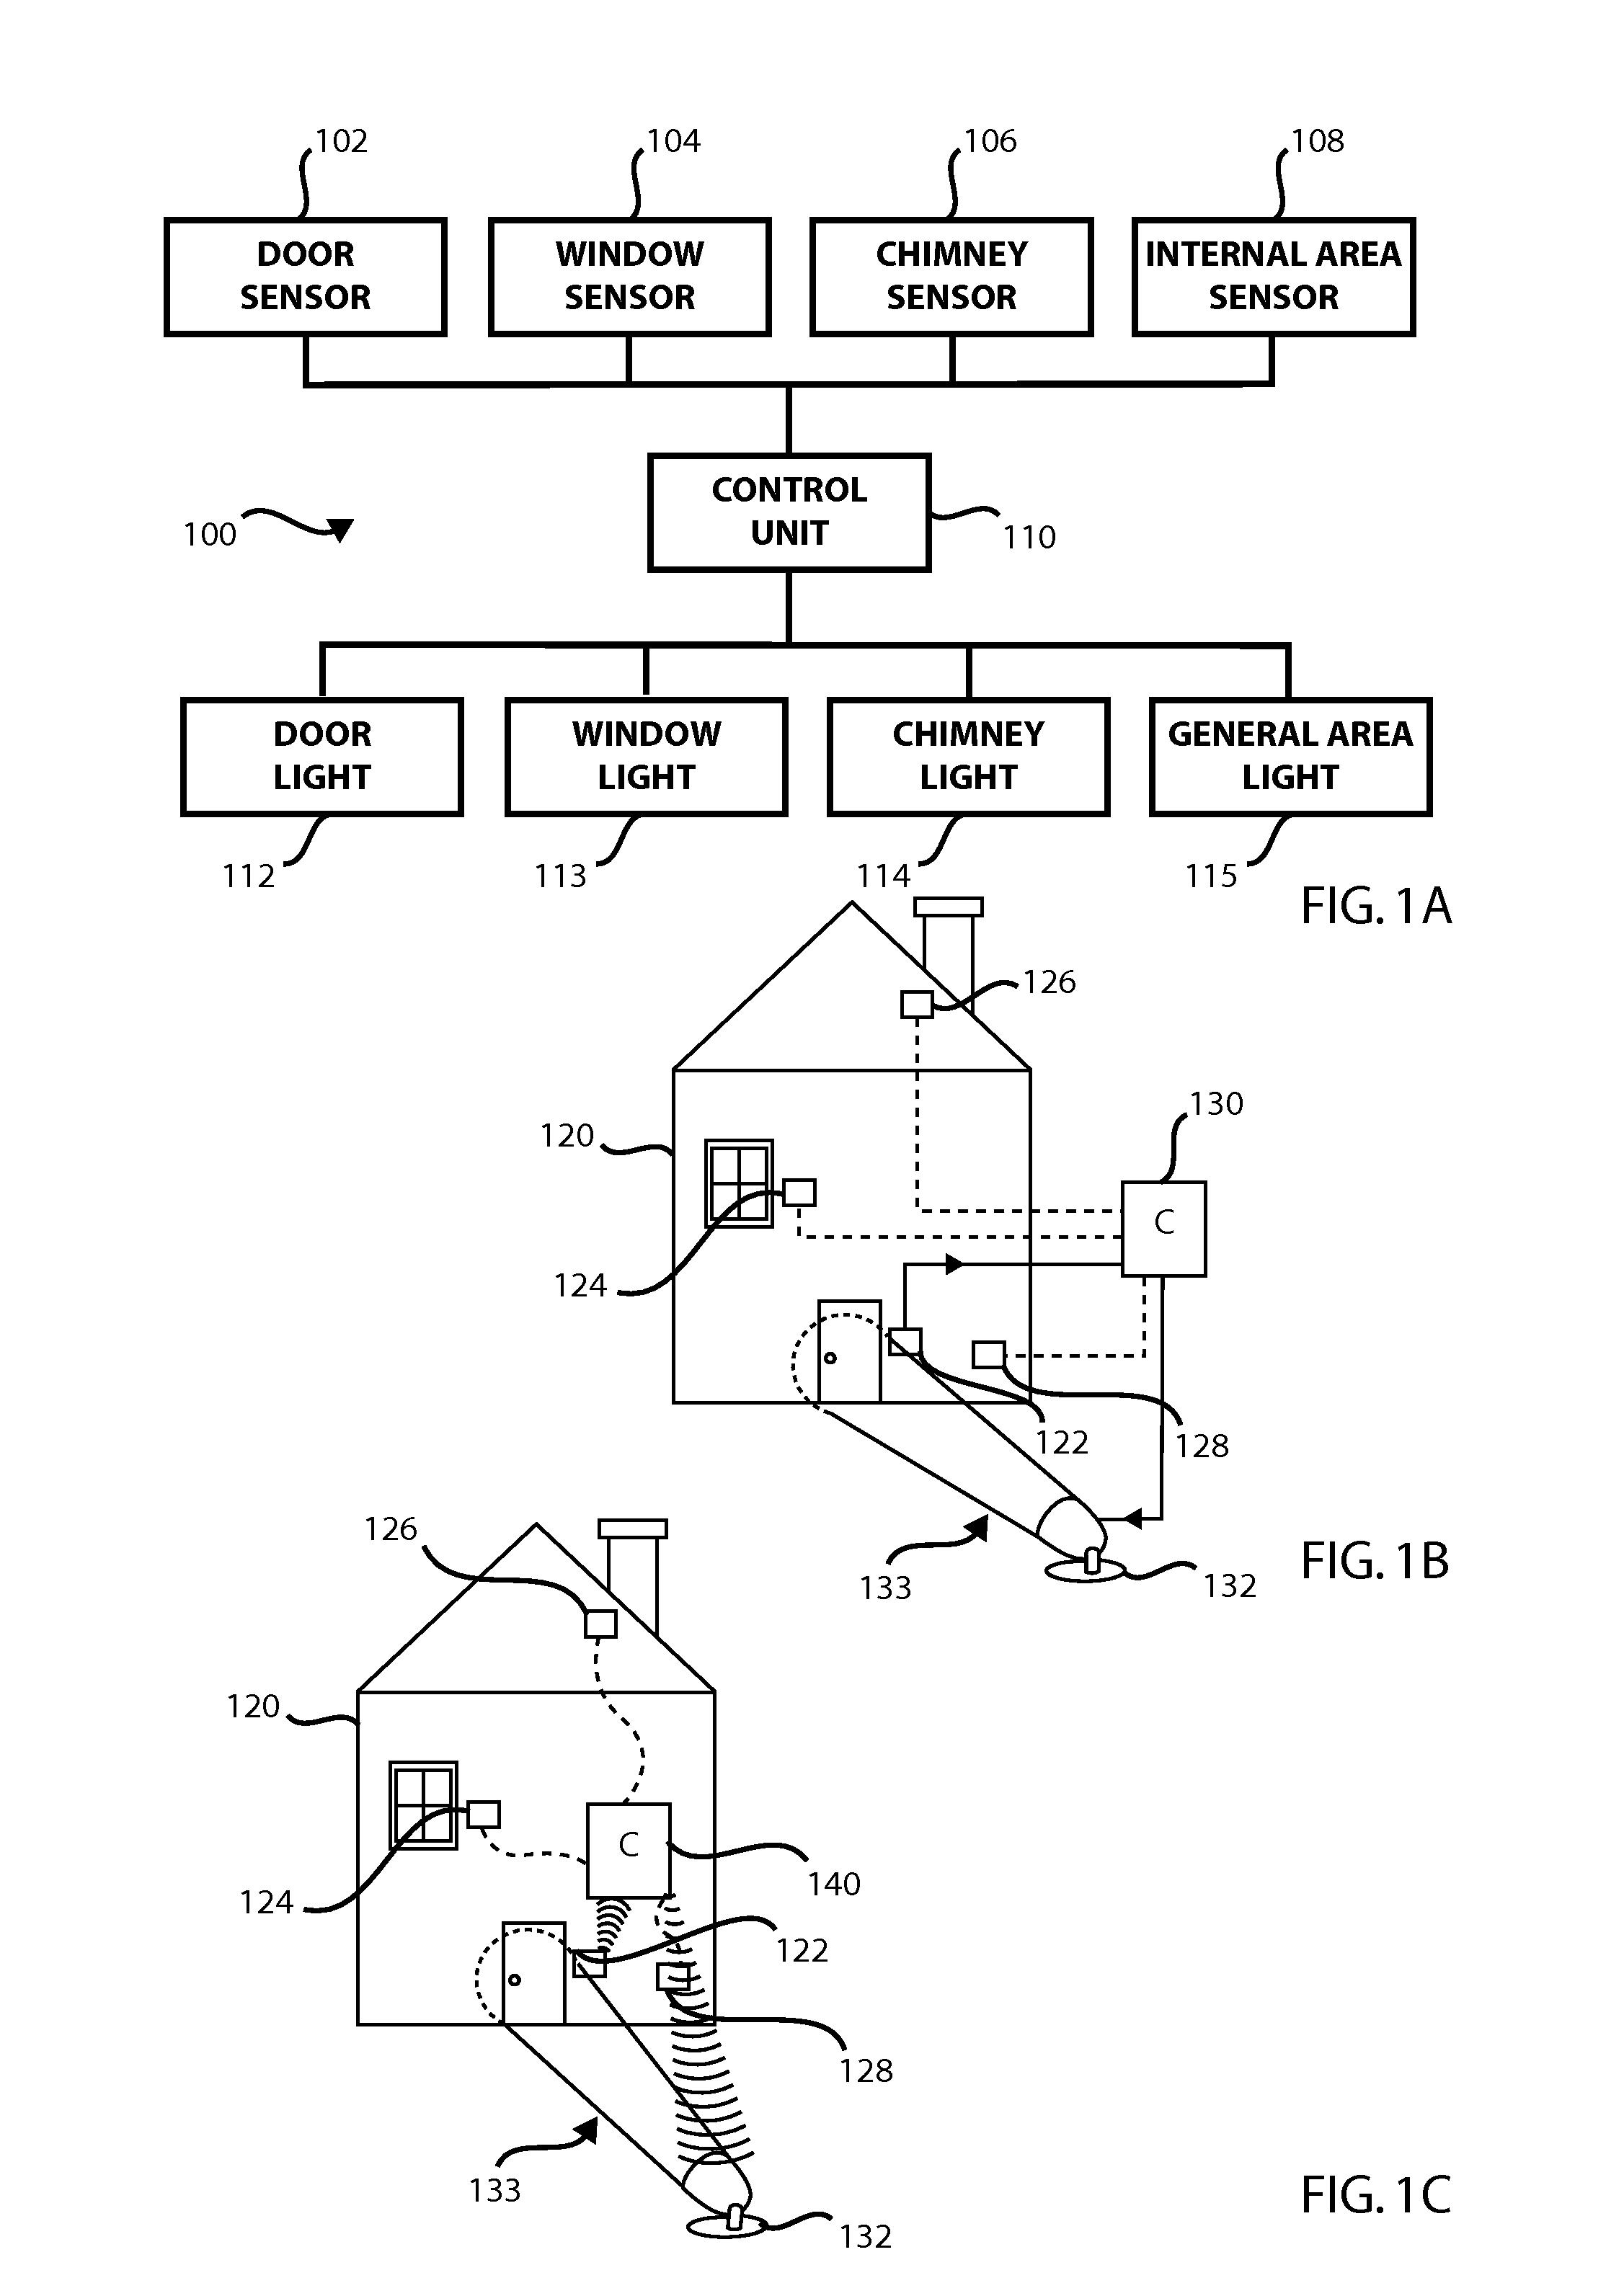 Wiring Diagram For Arlec Sensor Light Zenith Motion In The Home 4k Wiki Wallpapers 2018